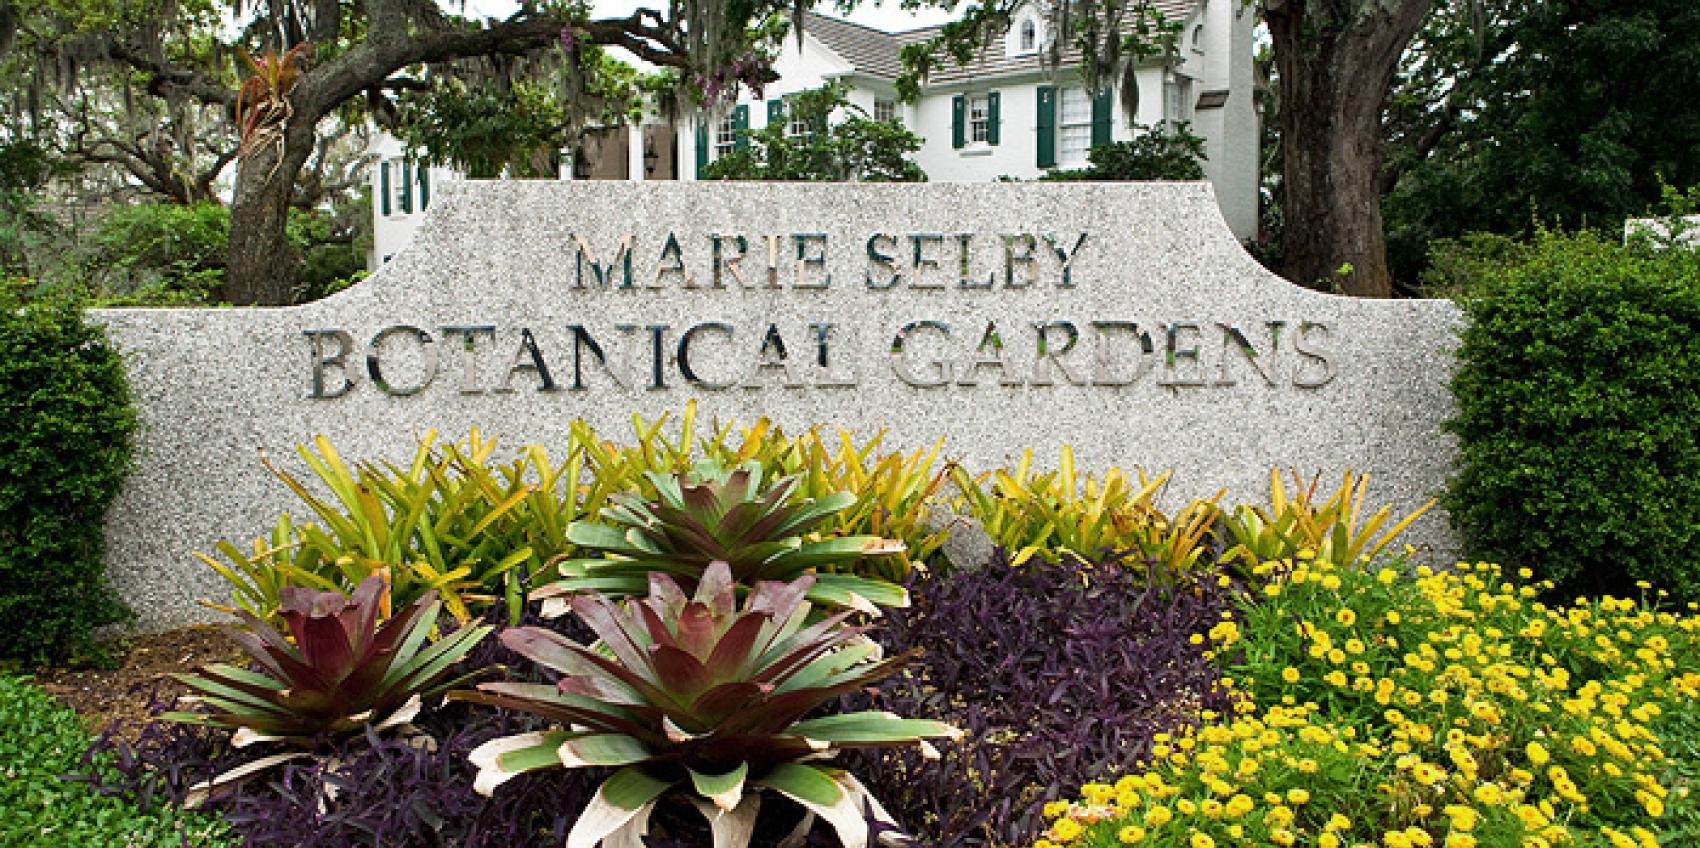 Marie Selby Botanical Gardens American Public Gardens Association